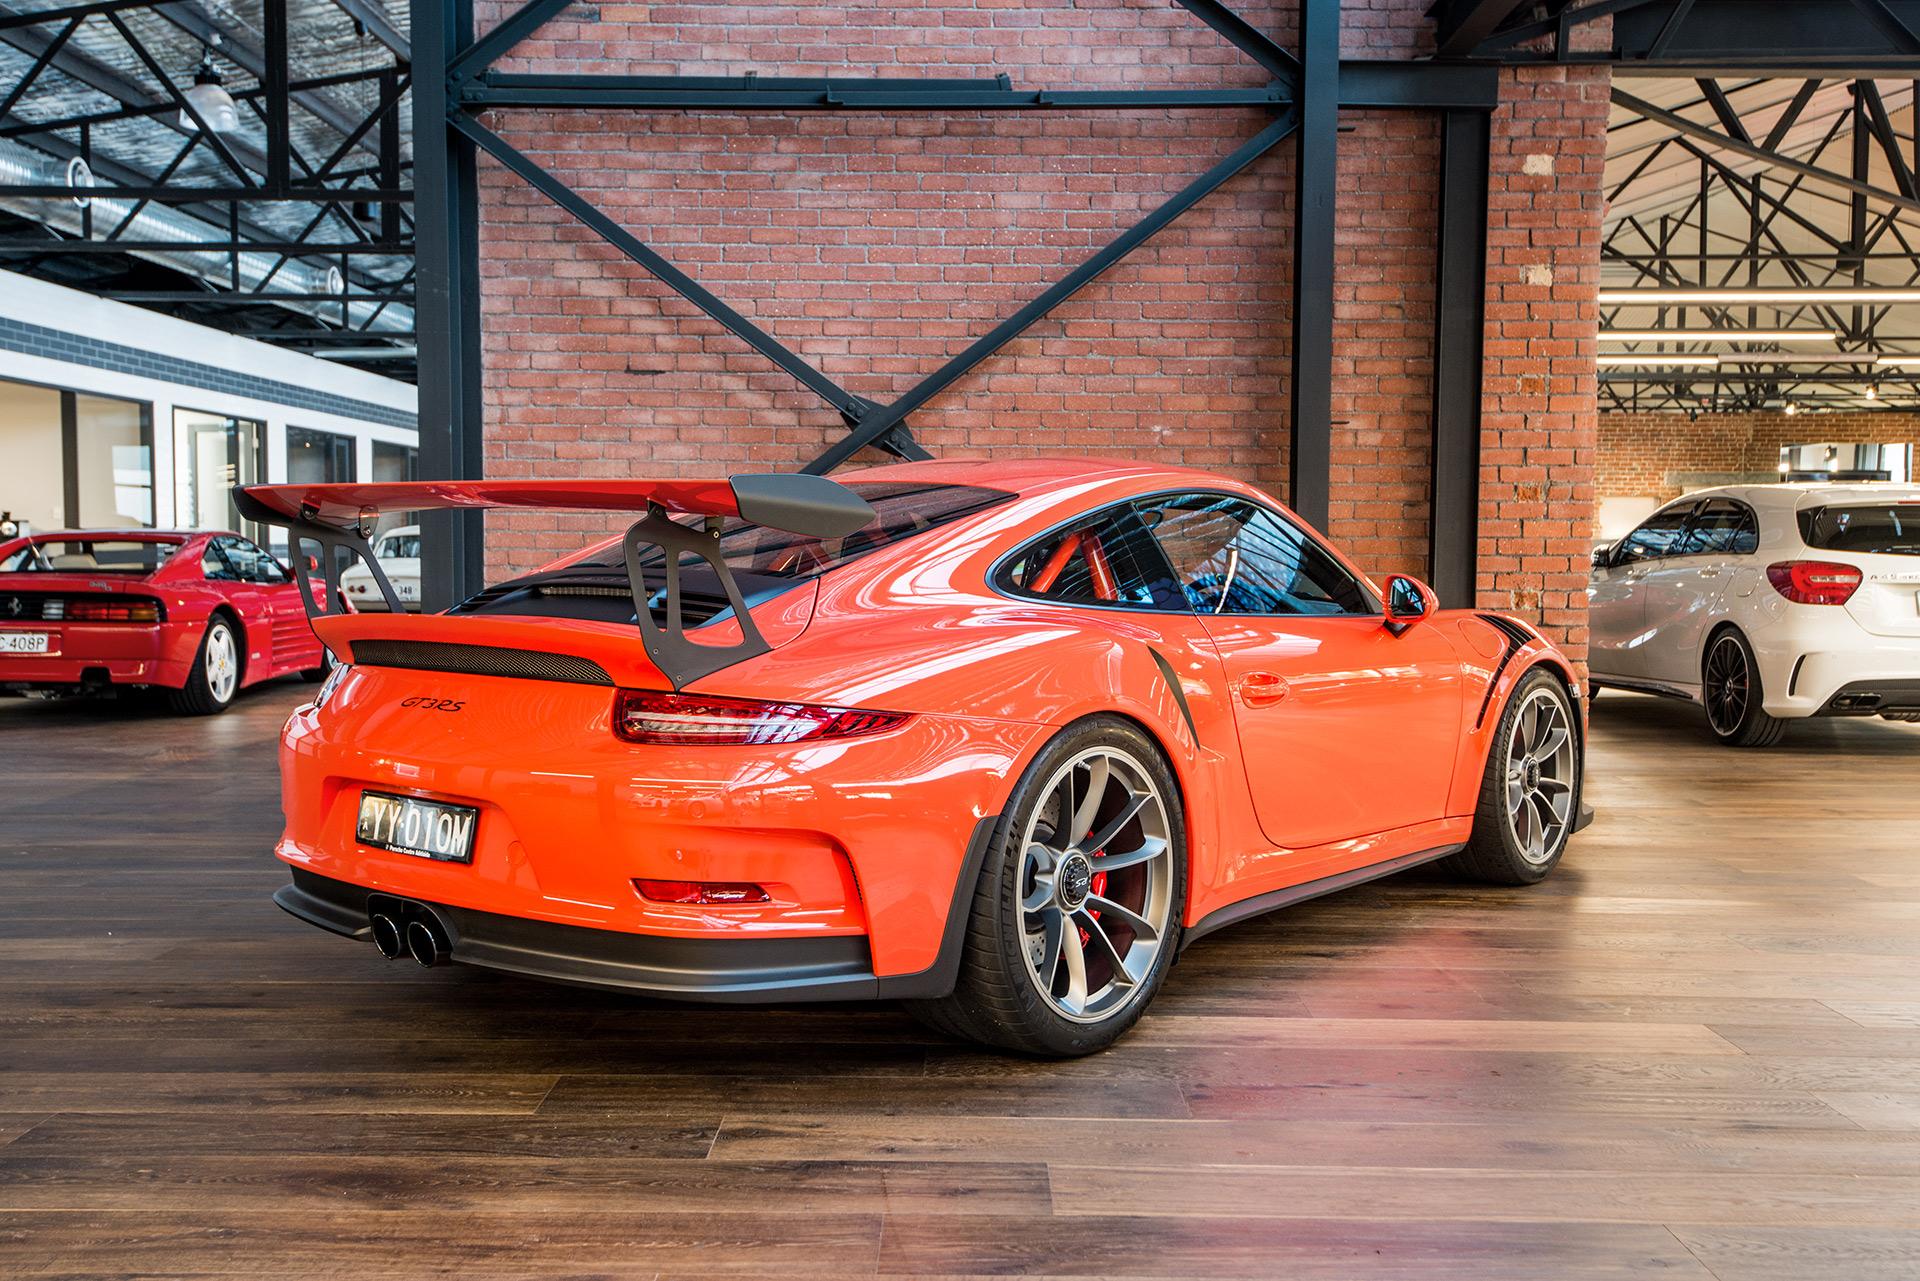 2016 porsche gt3 rs - richmonds - classic and prestige cars - storage and sales